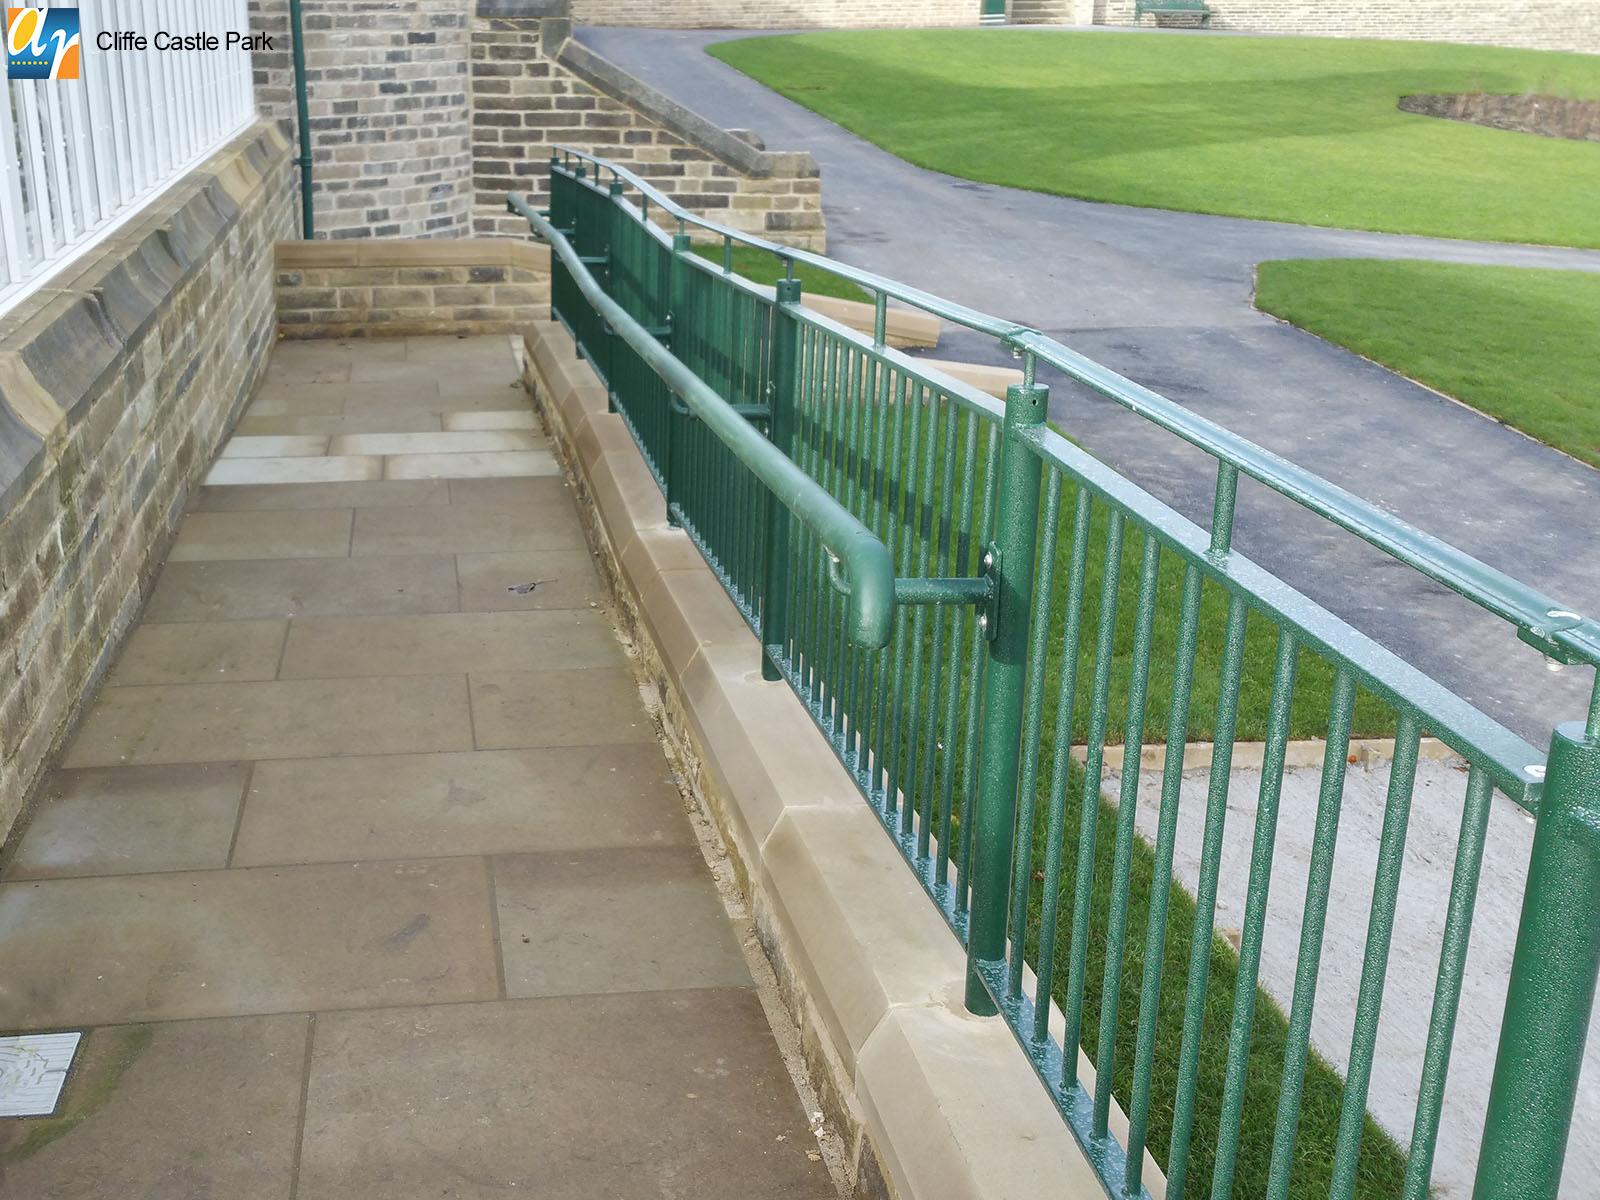 Cliffe Castle Park balustrade